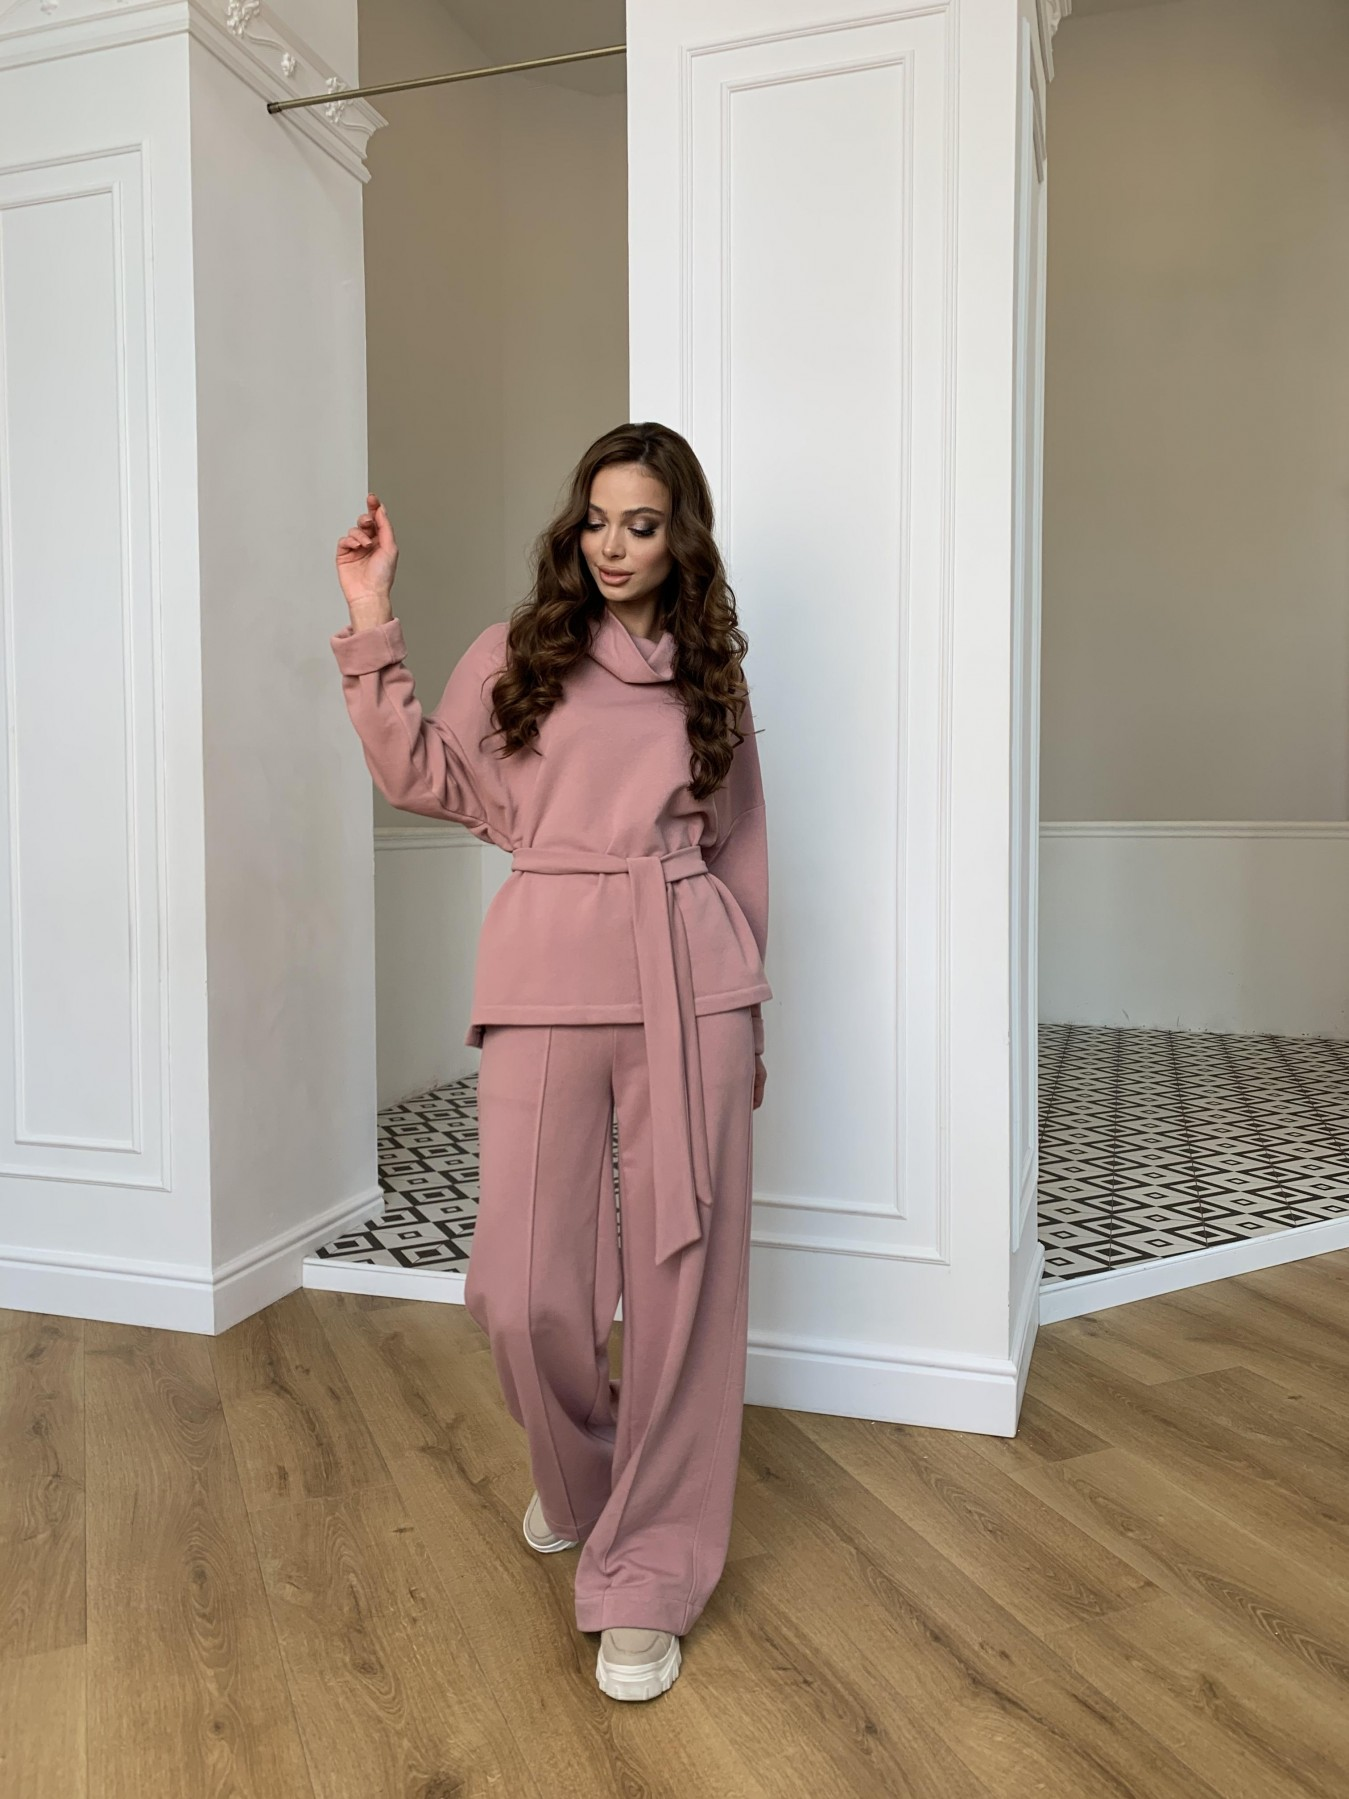 Джаст костюм Oversize  3х нитка 10564 АРТ. 47244 Цвет: Пудра - фото 3, интернет магазин tm-modus.ru